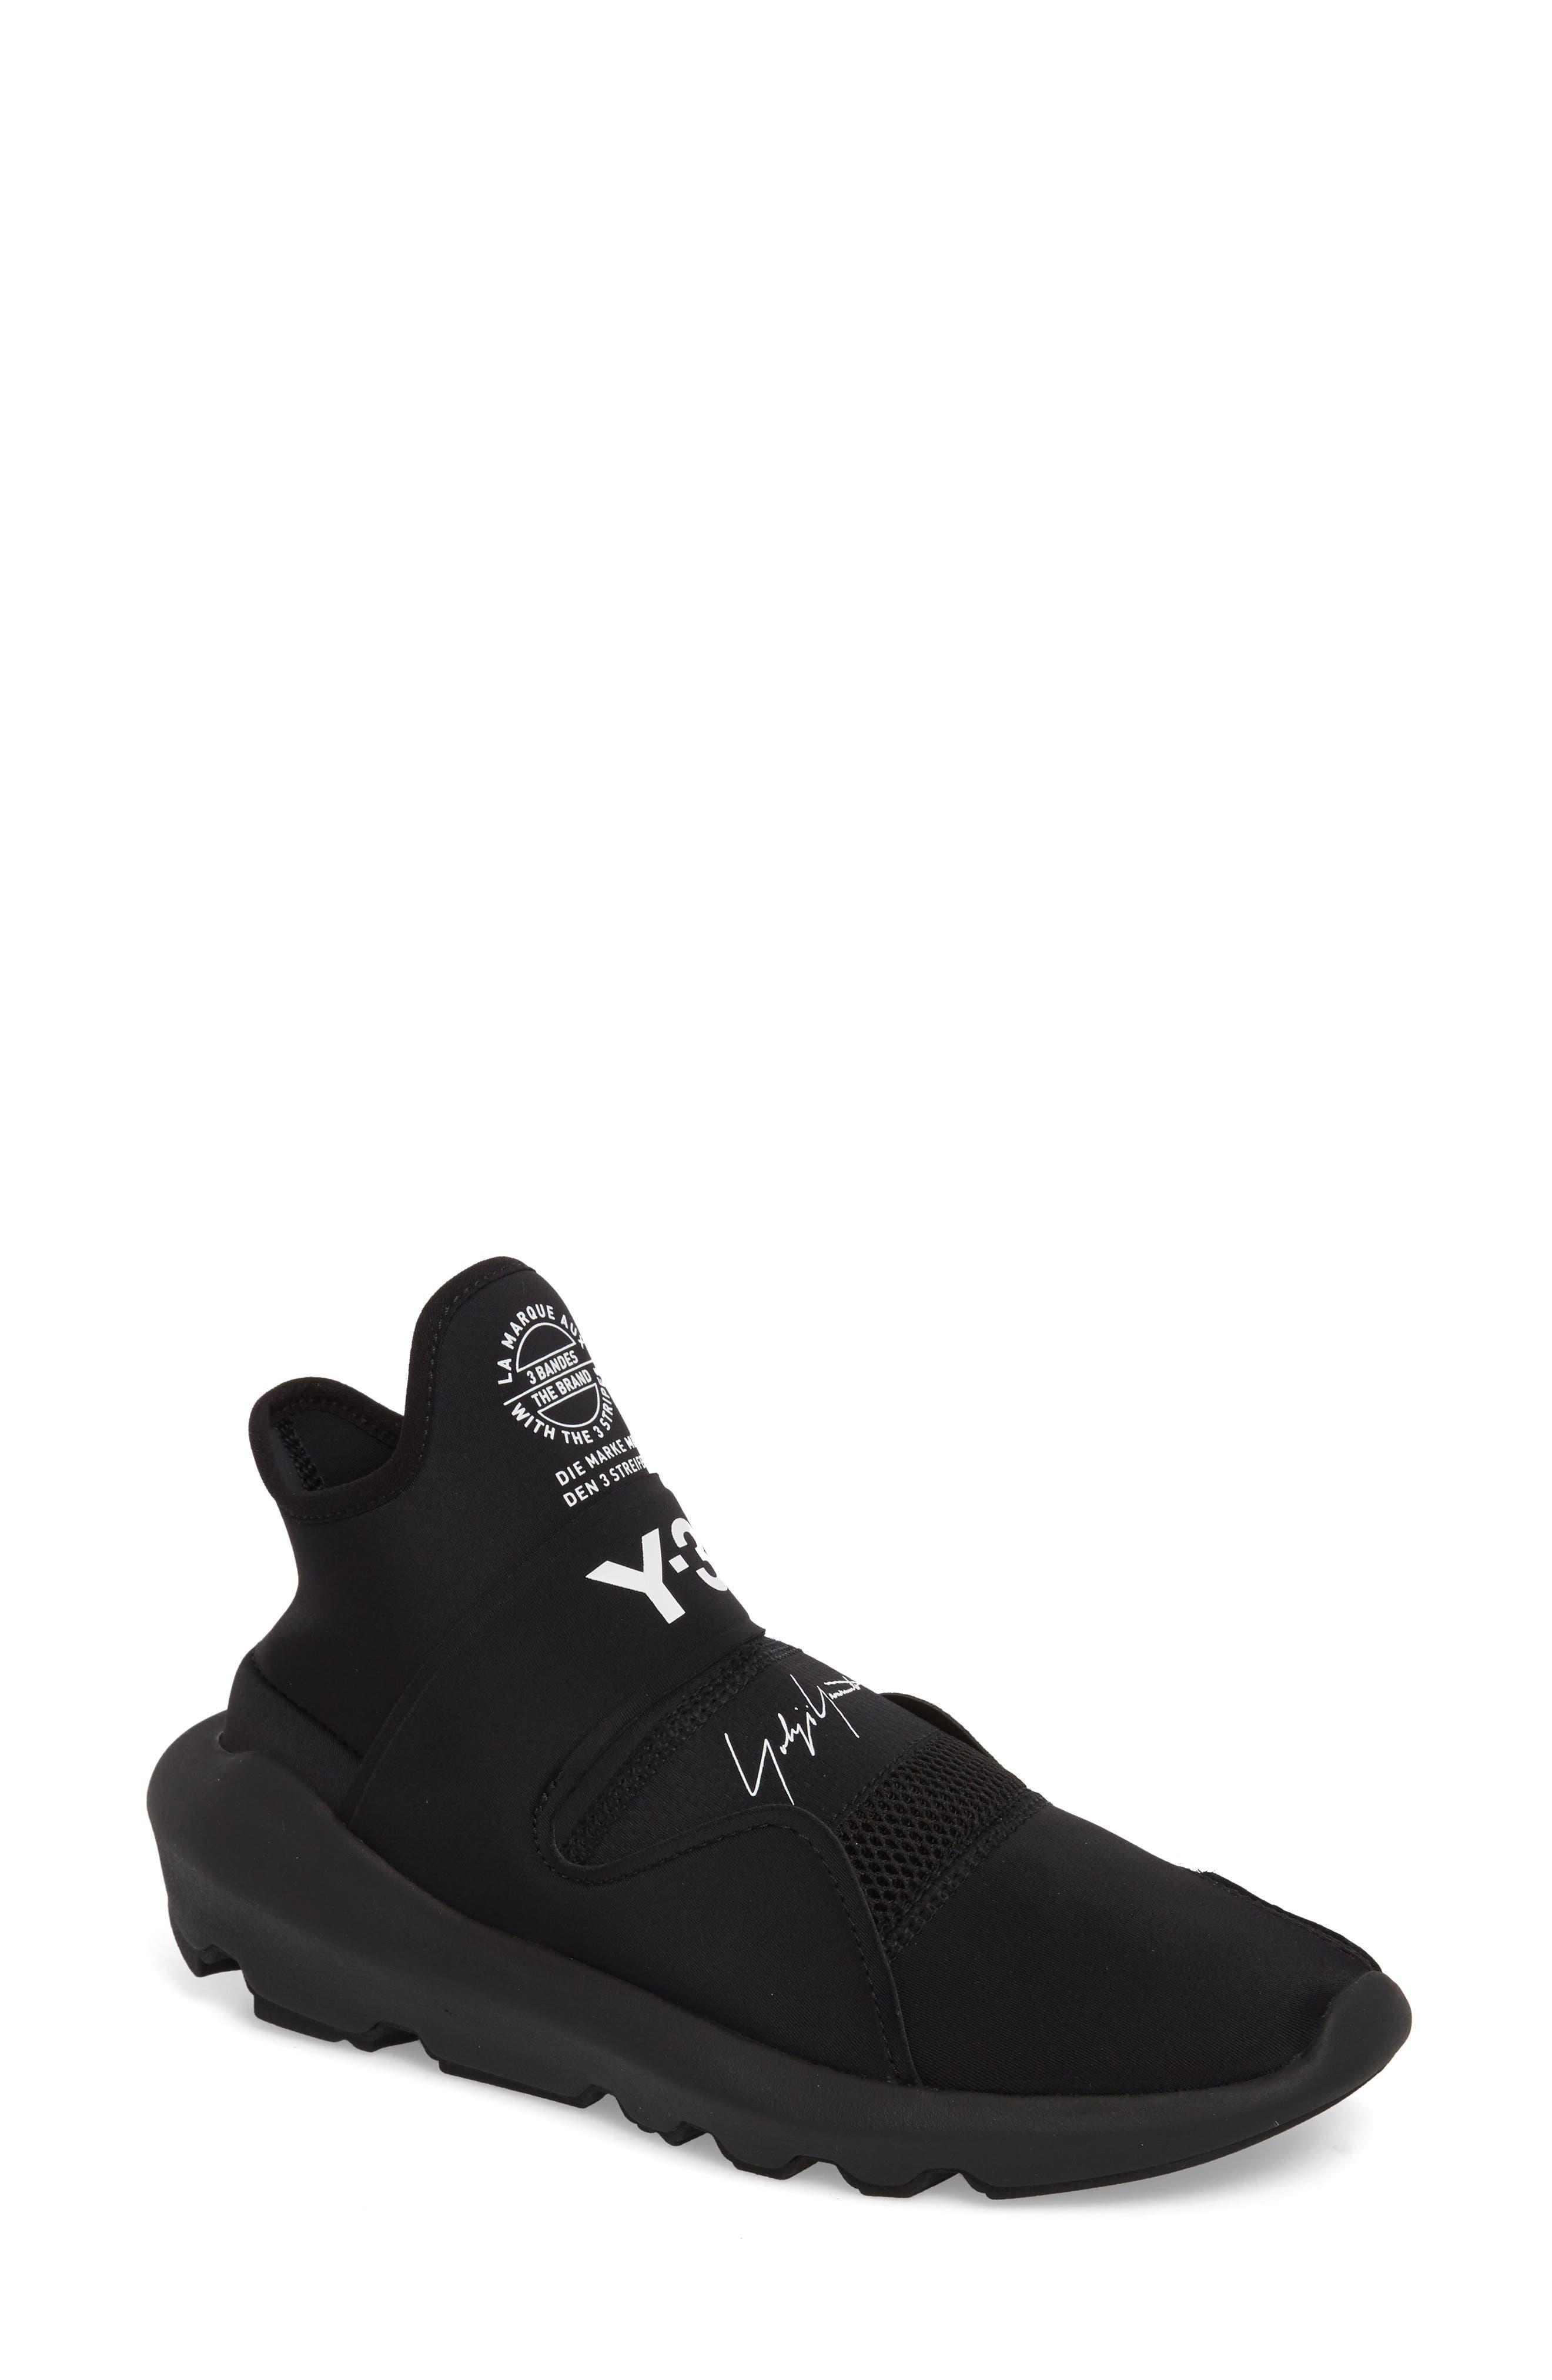 Y-3 Superbou Sneaker (Women)